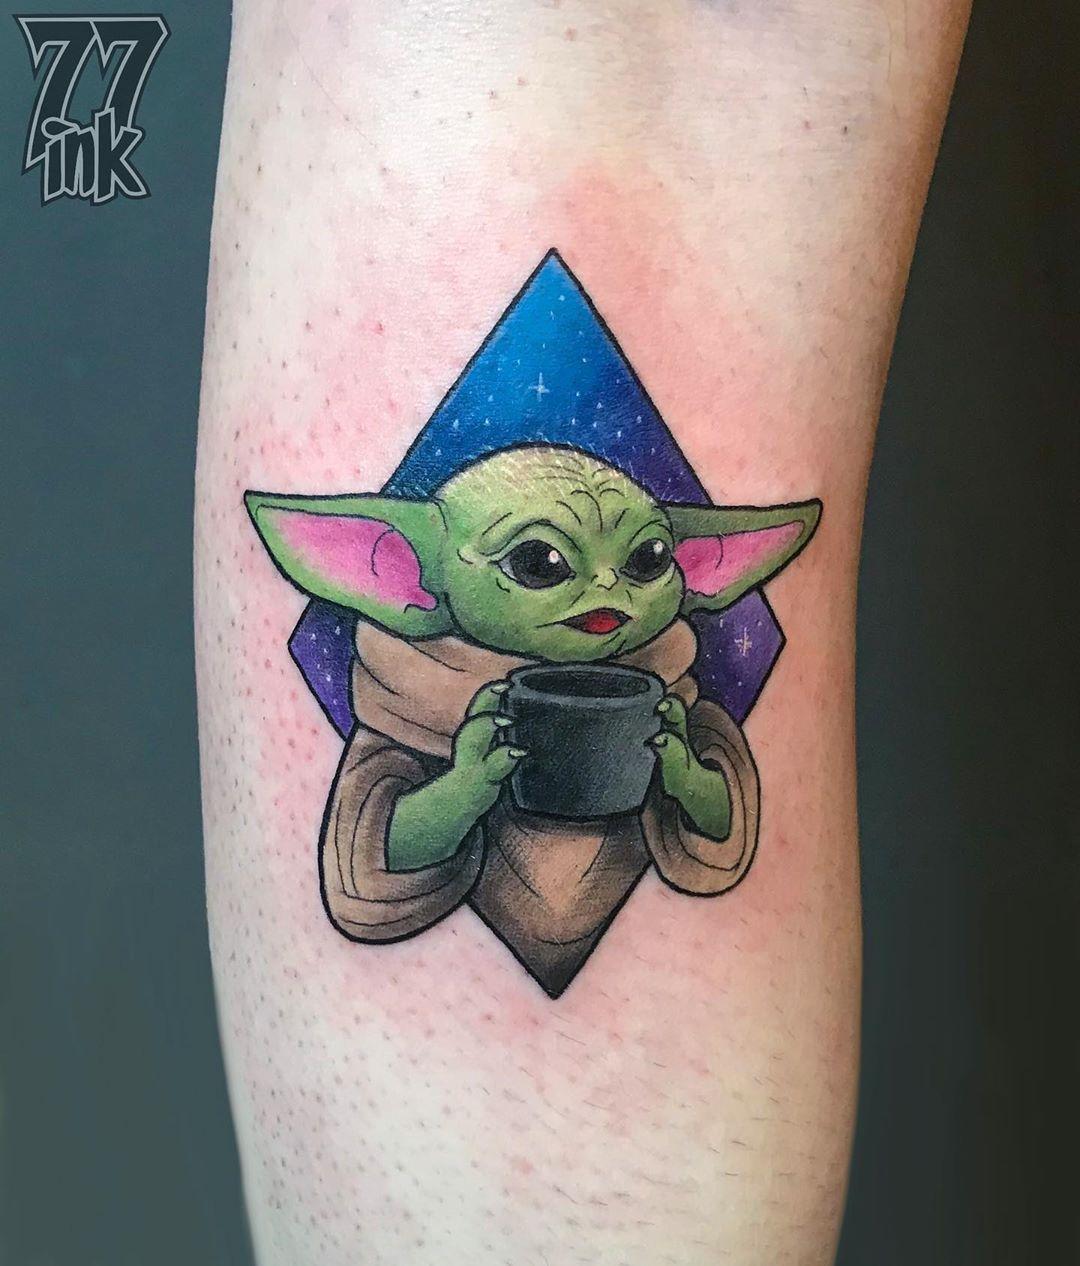 Updated 30 Baby Yoda Tattoos February 2020 In 2020 Star Wars